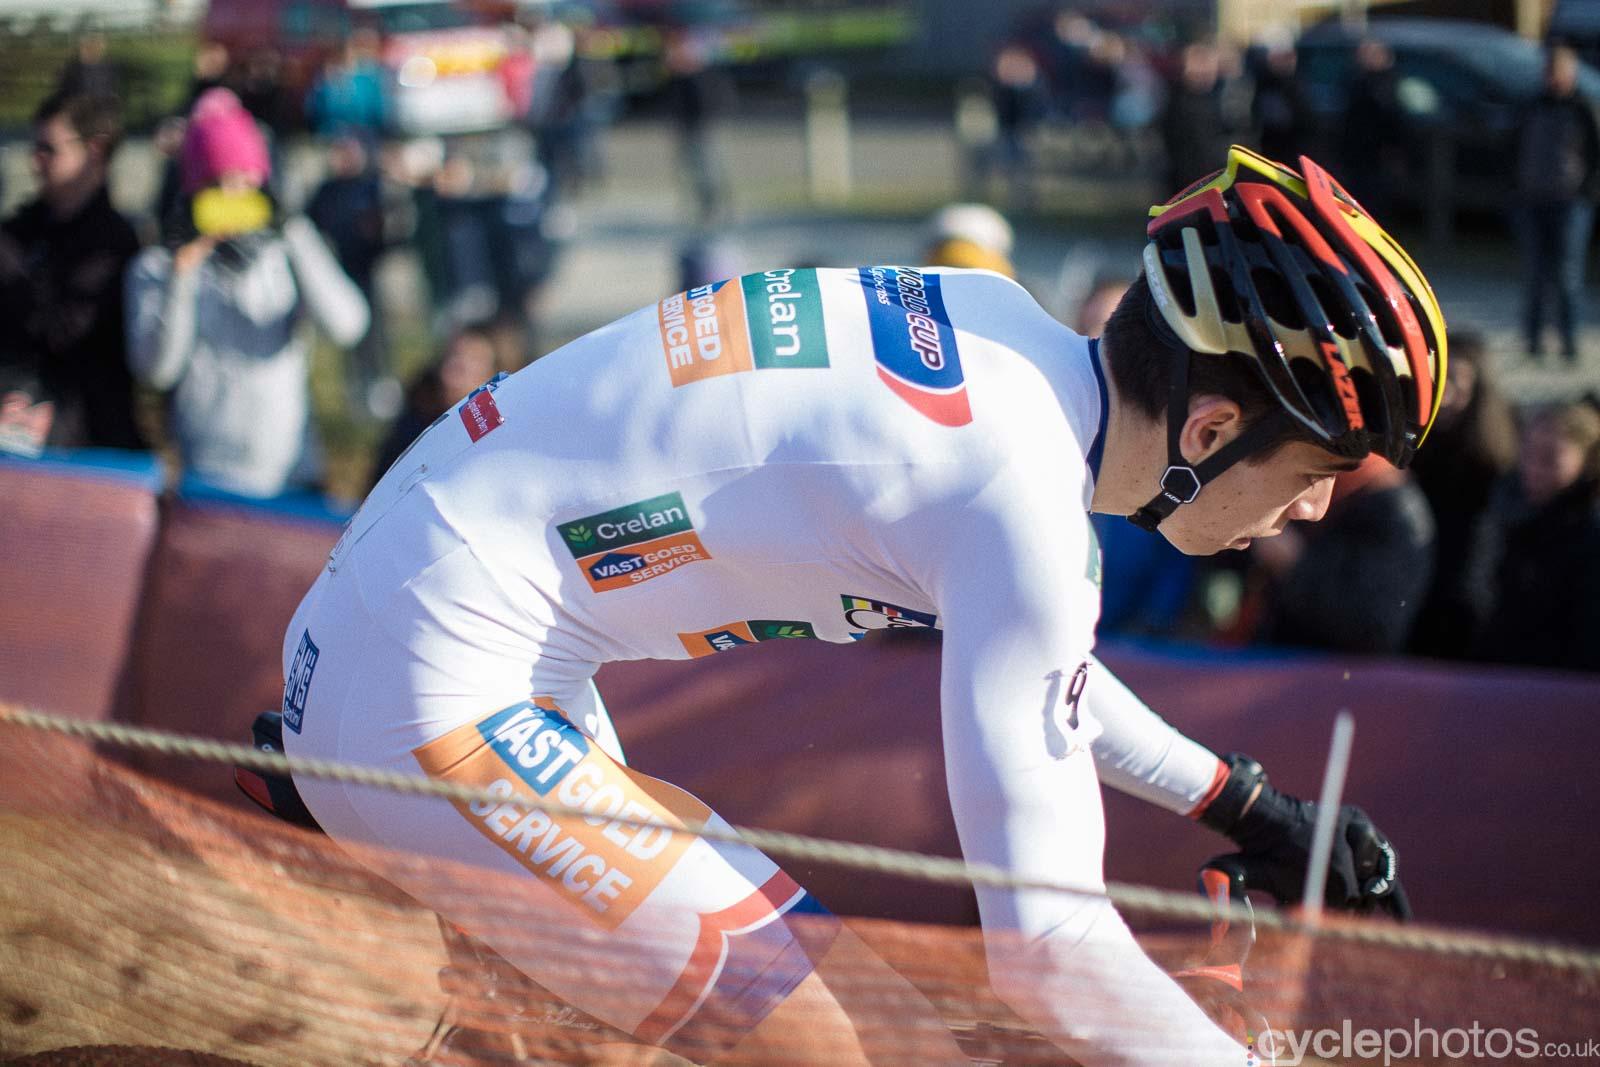 2016-cyclephotos-cyclocross-lignieres-150058-wout-van-aert